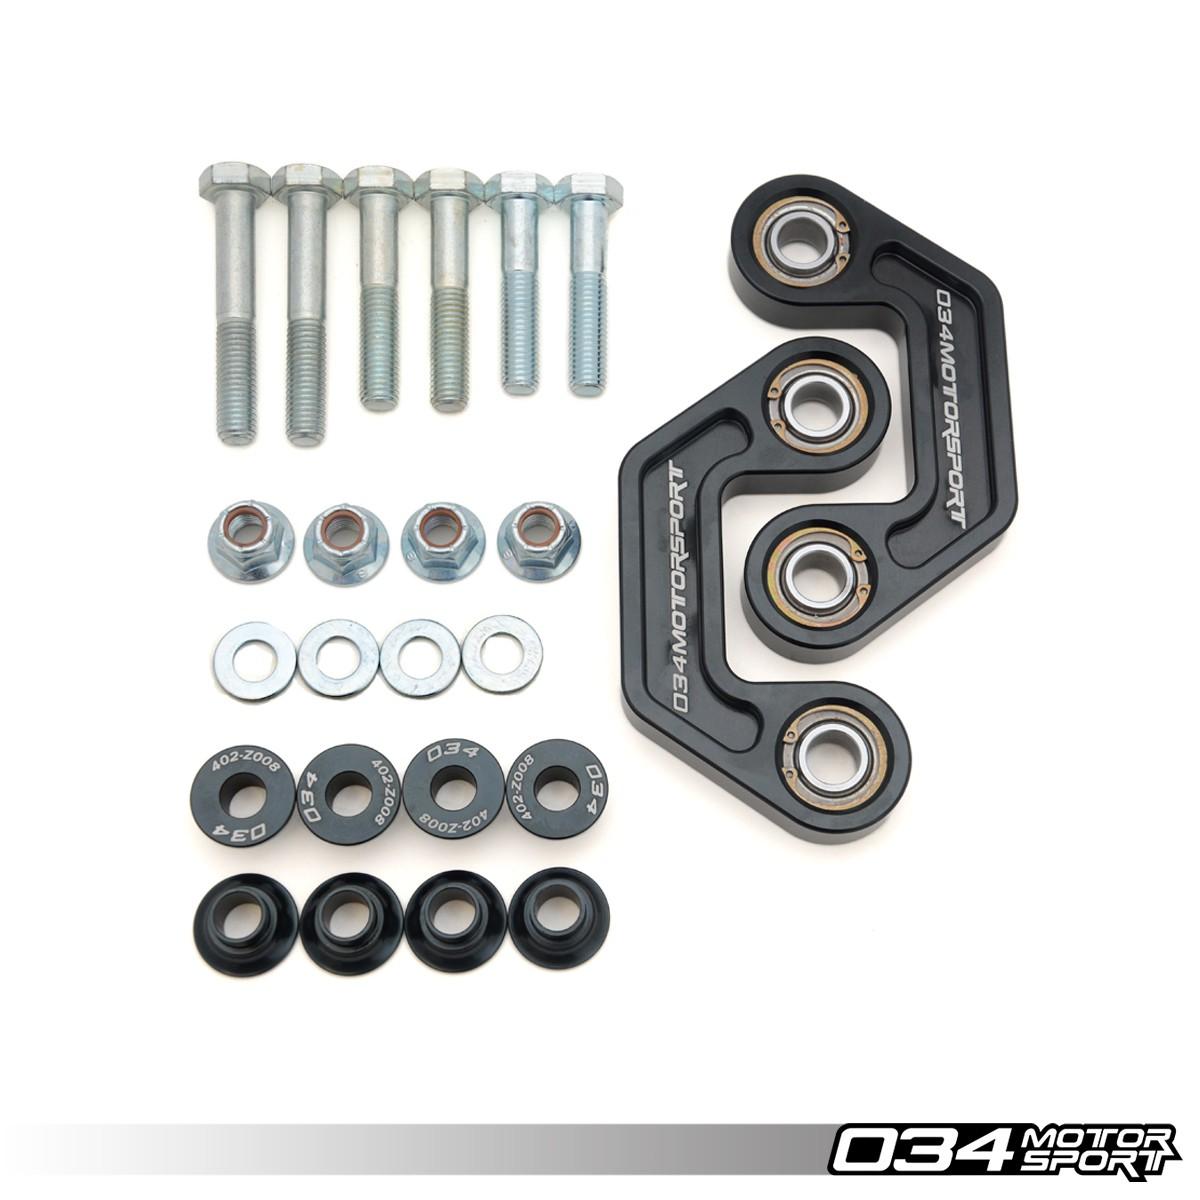 2 Pieces Front Sway Bar End Link Suspension Kit for Audi A4 A4 Quattro A6 A6 QUATTRO RS6 S4 S6 VOLKSWAGEN PASSAT